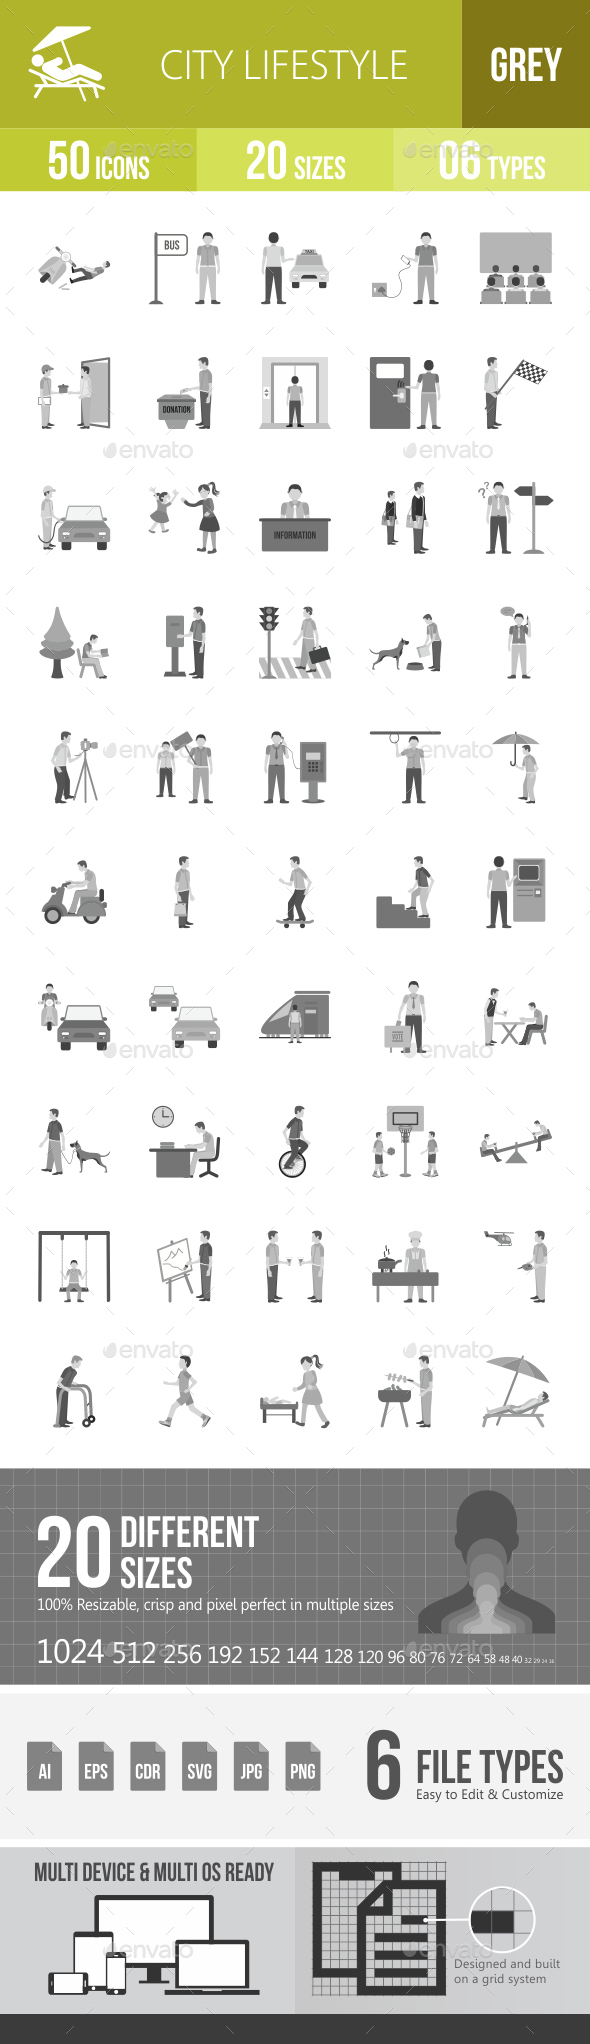 City Lifestyle Greyscale Icons - Icons